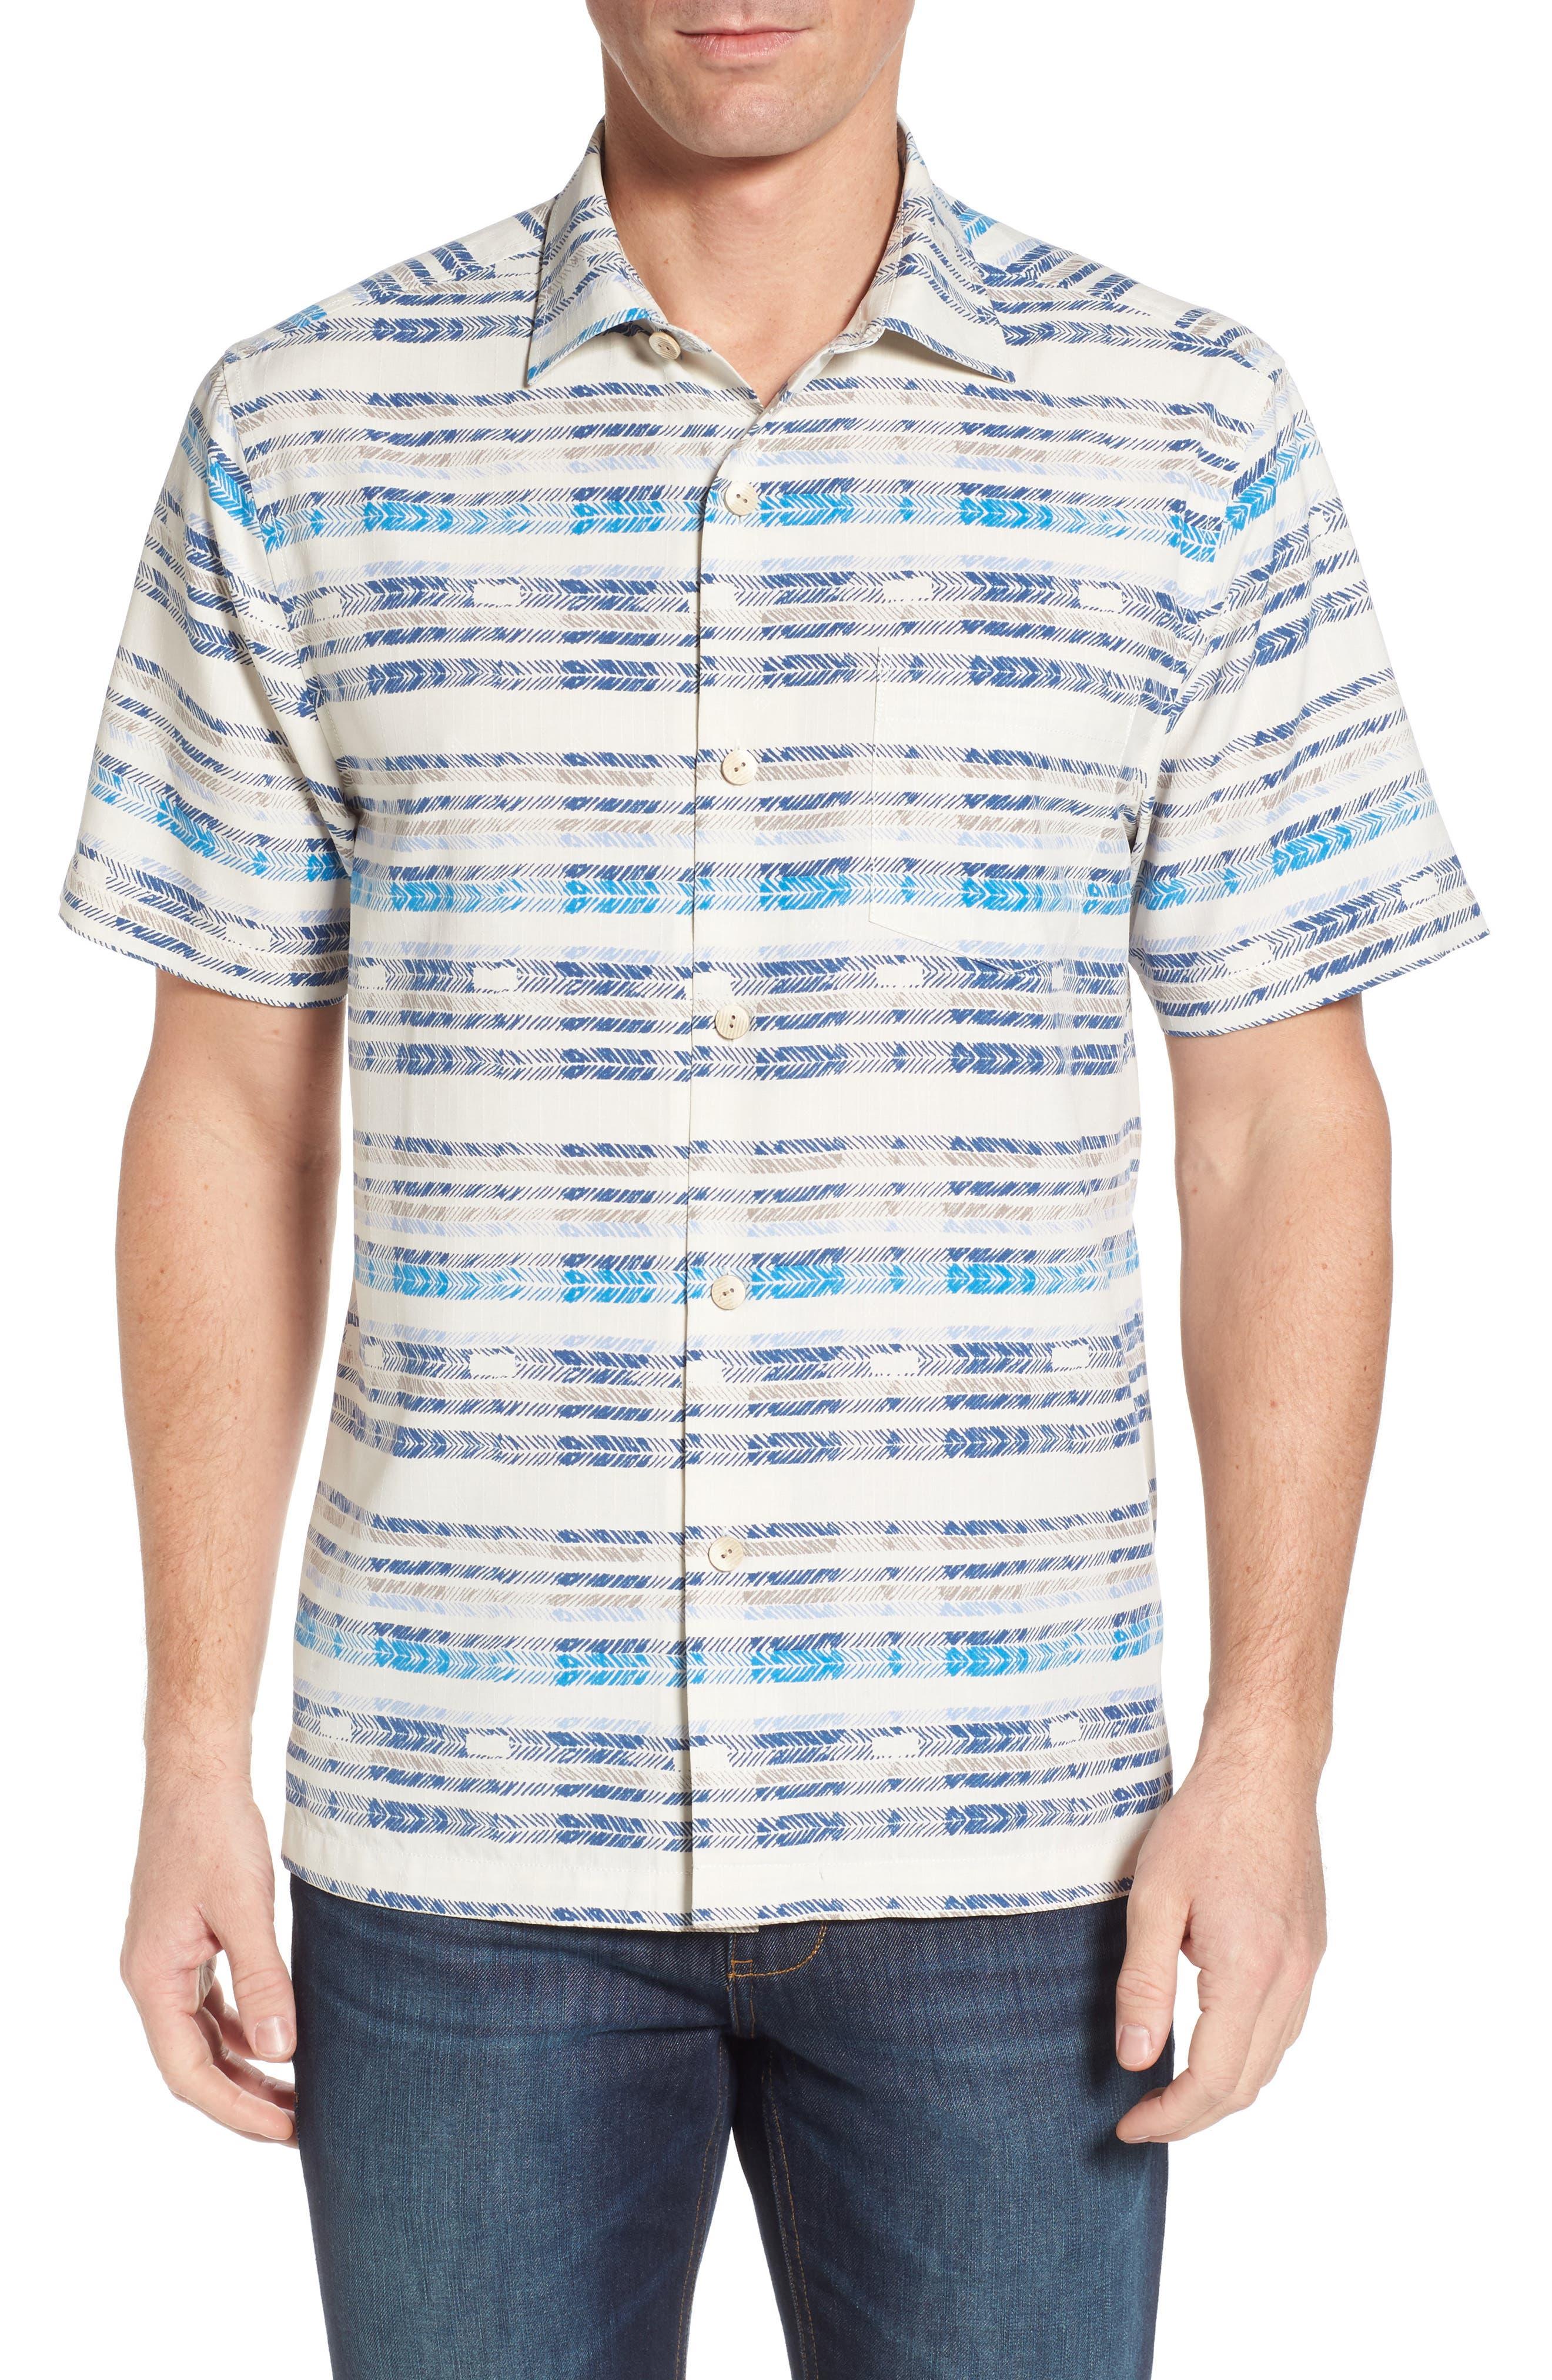 Breaker Bay Sport Shirt,                         Main,                         color, Coconut Cream